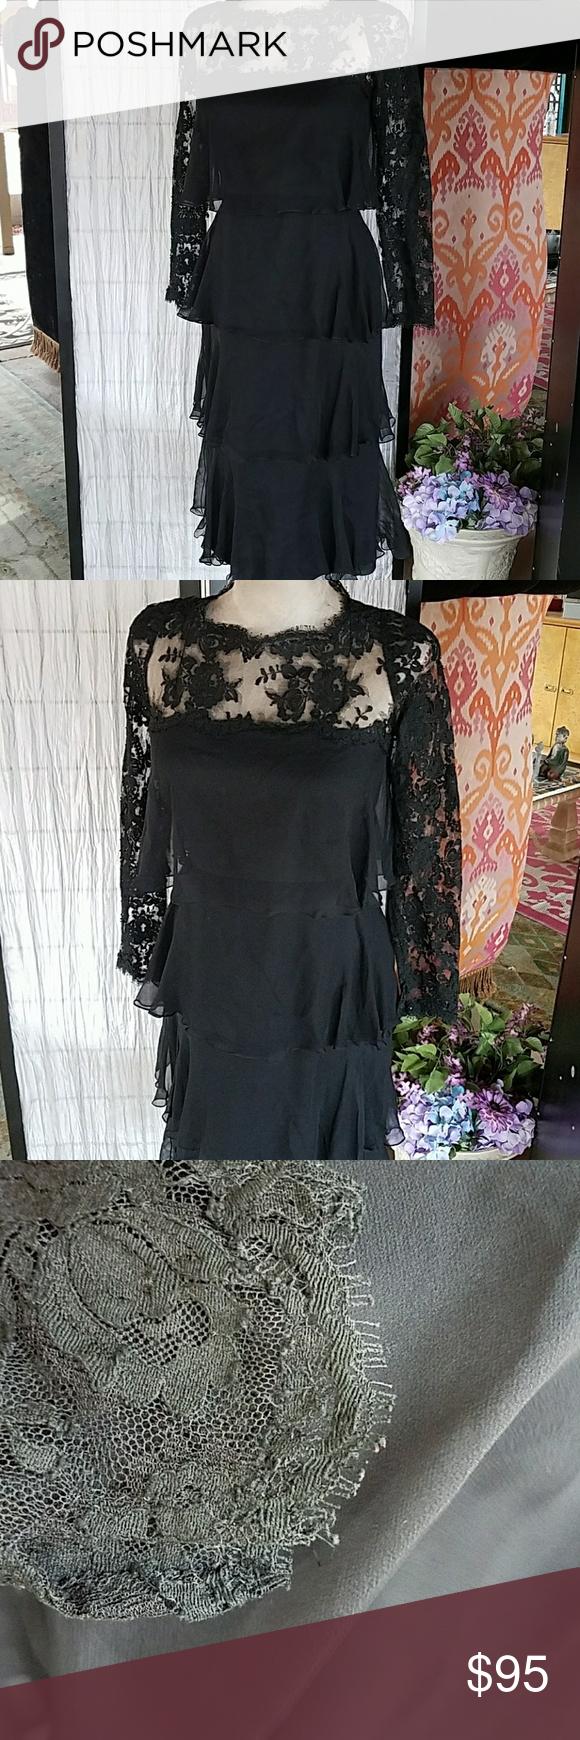 Vintage Lace Silk dress Formal Cocktail sz SM 4 xs Beautiful vintage dress size ...